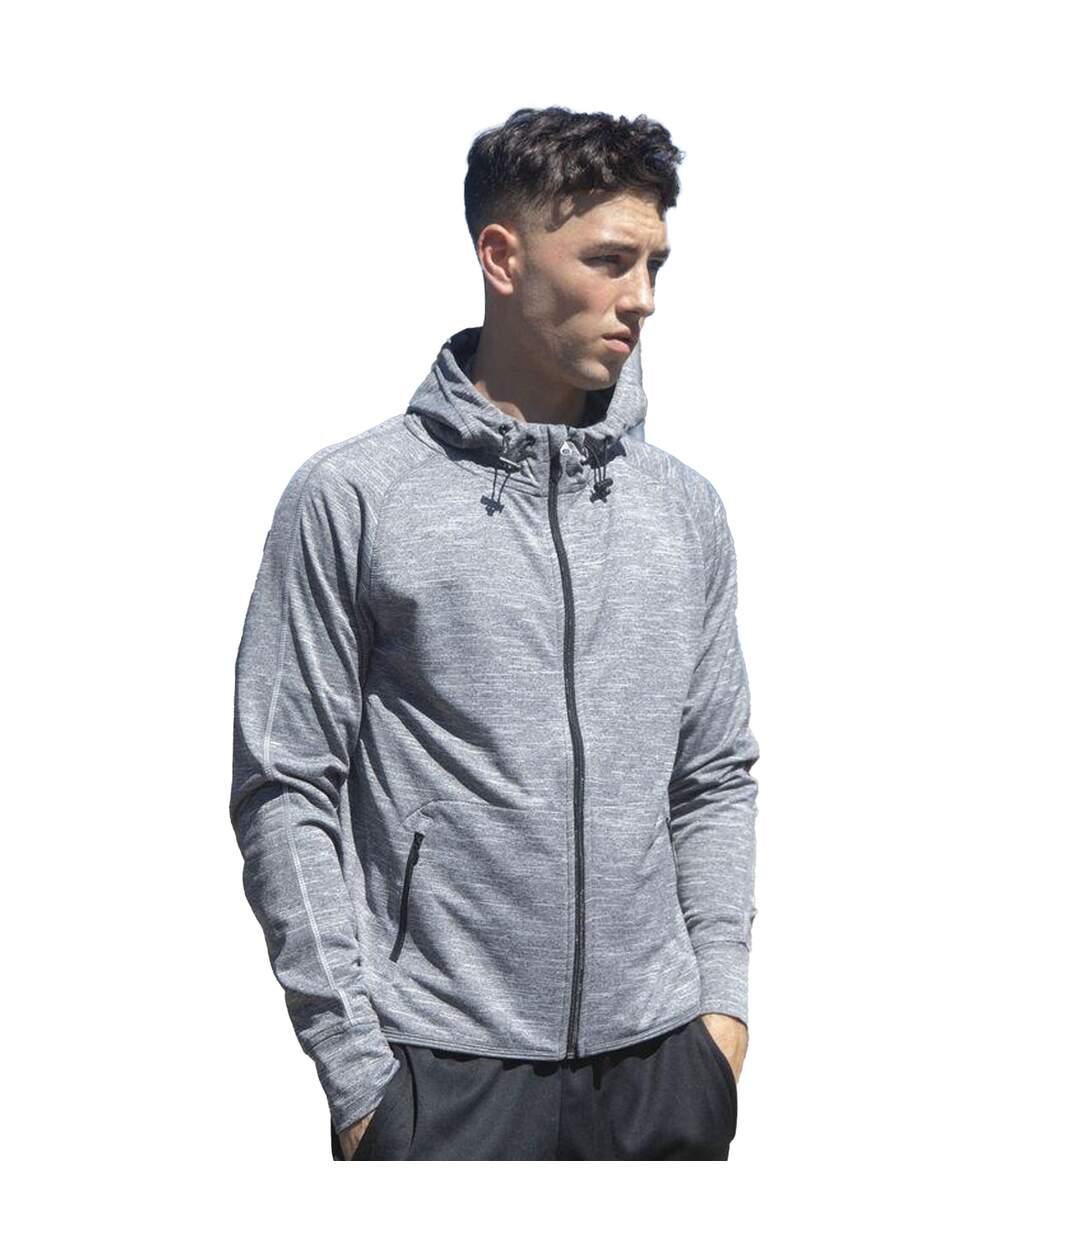 Tombo Teamsport - Sweatshirt Léger À Capuche Et Fermeture Zippée - Homme (Bleu marine) - UTRW4453